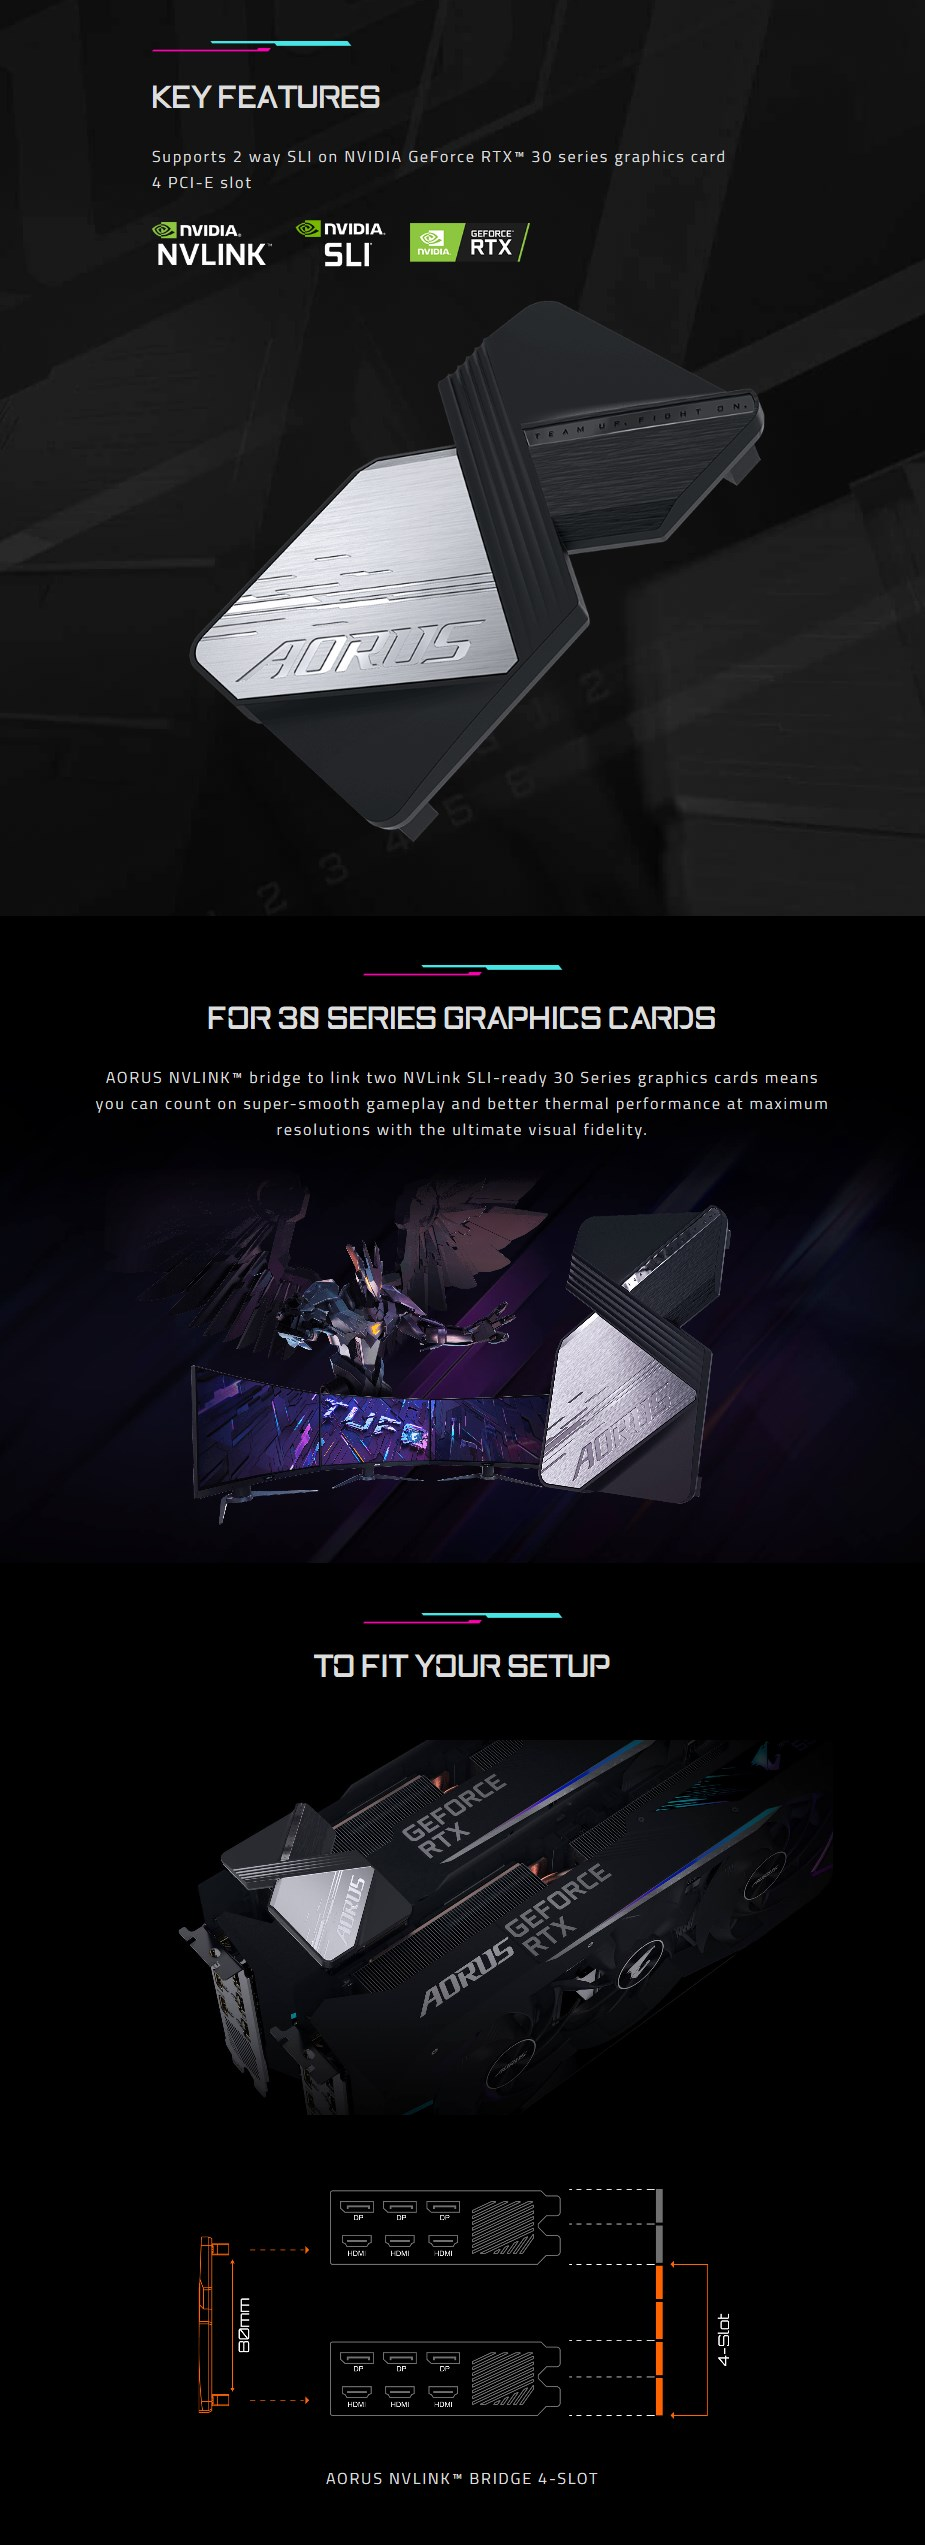 Gigabyte AORUS GeForce RTX NVLINK Bridge for 30 Series - Overview 1